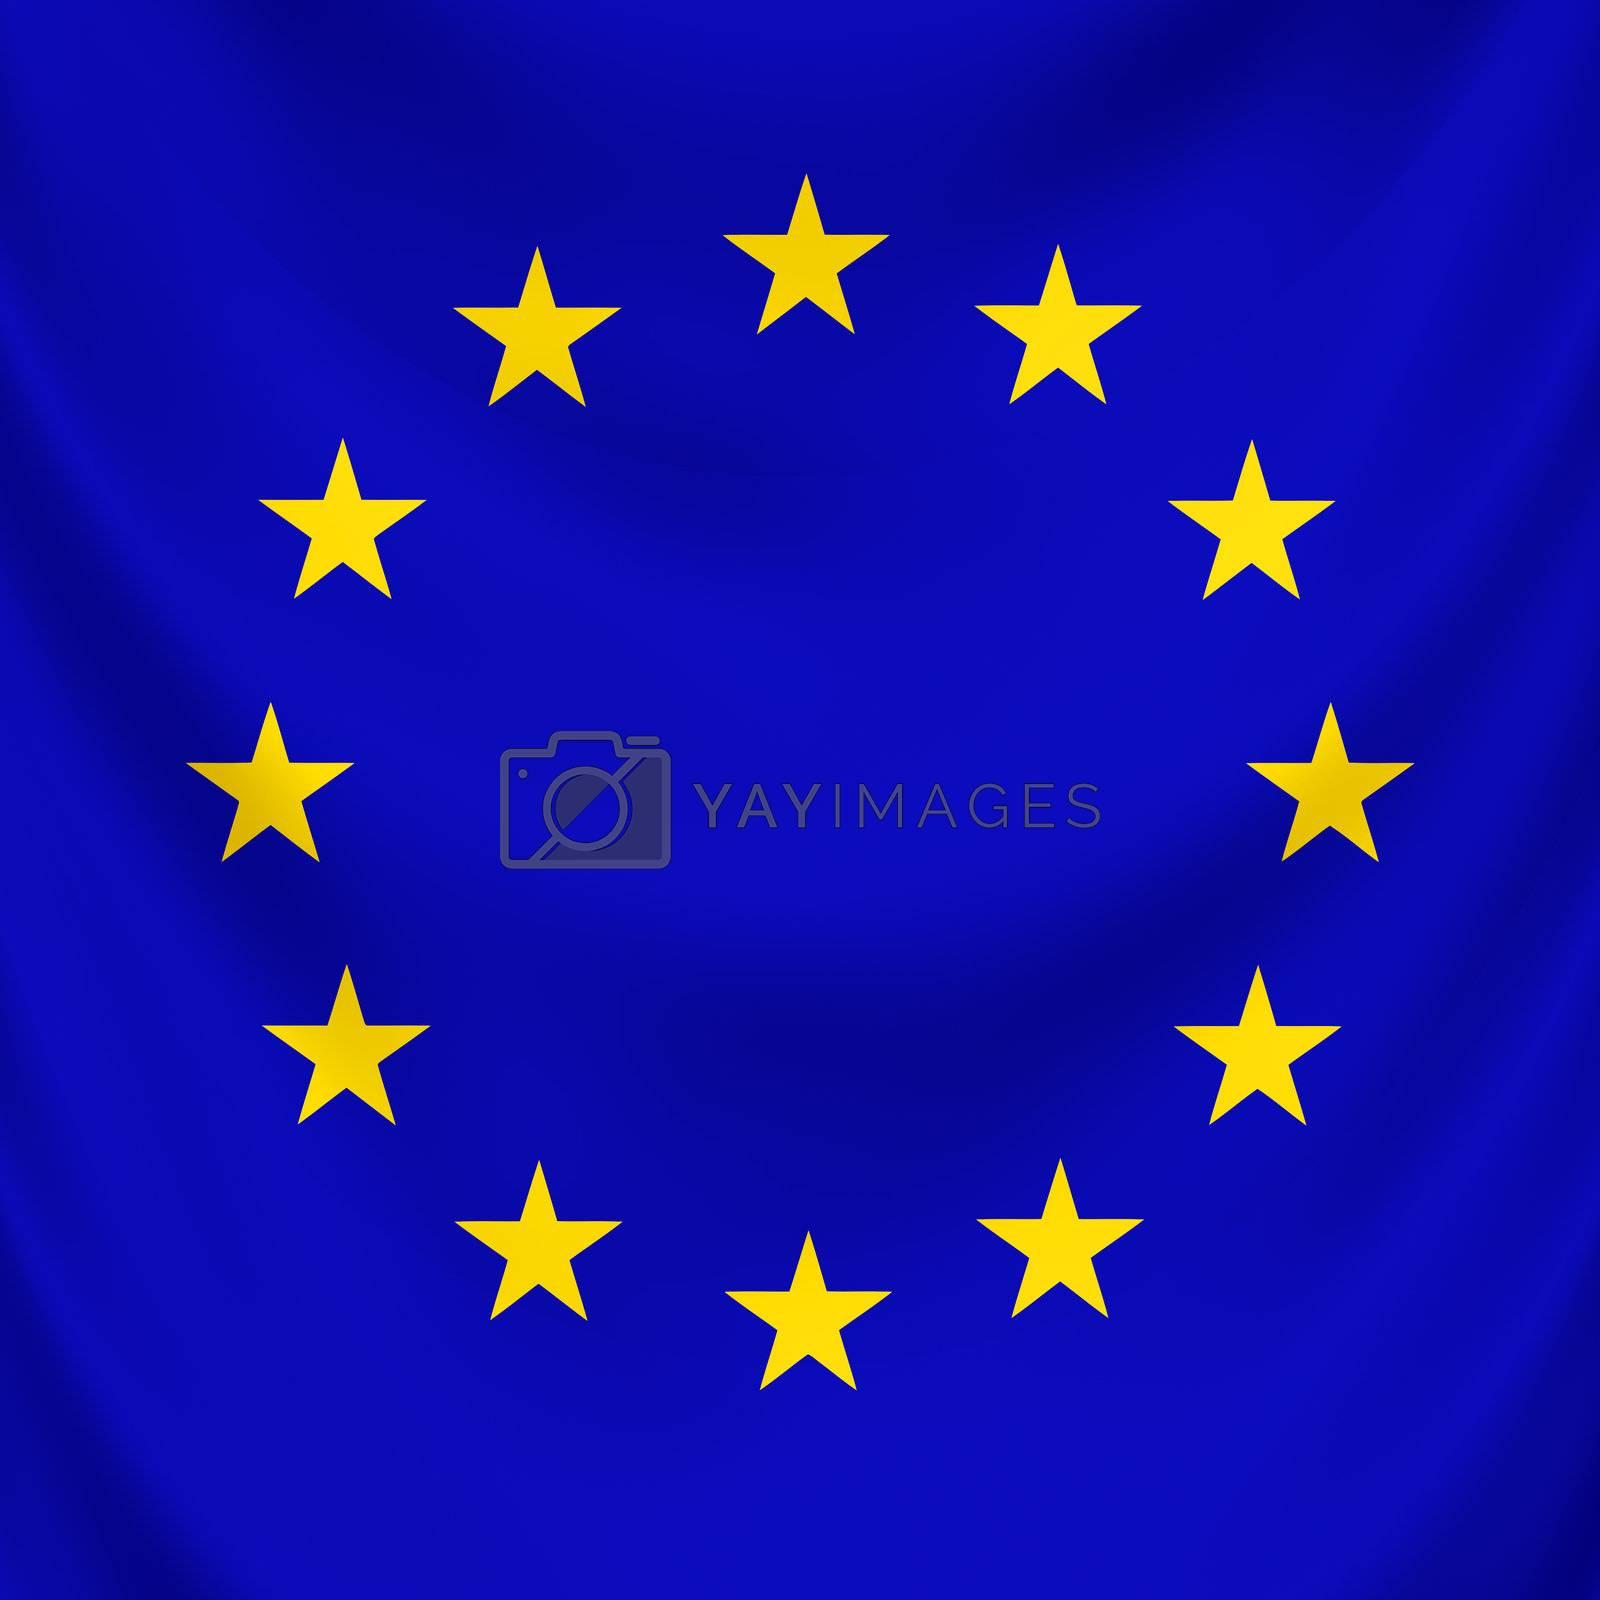 Symbol of united countries in Europe, EU